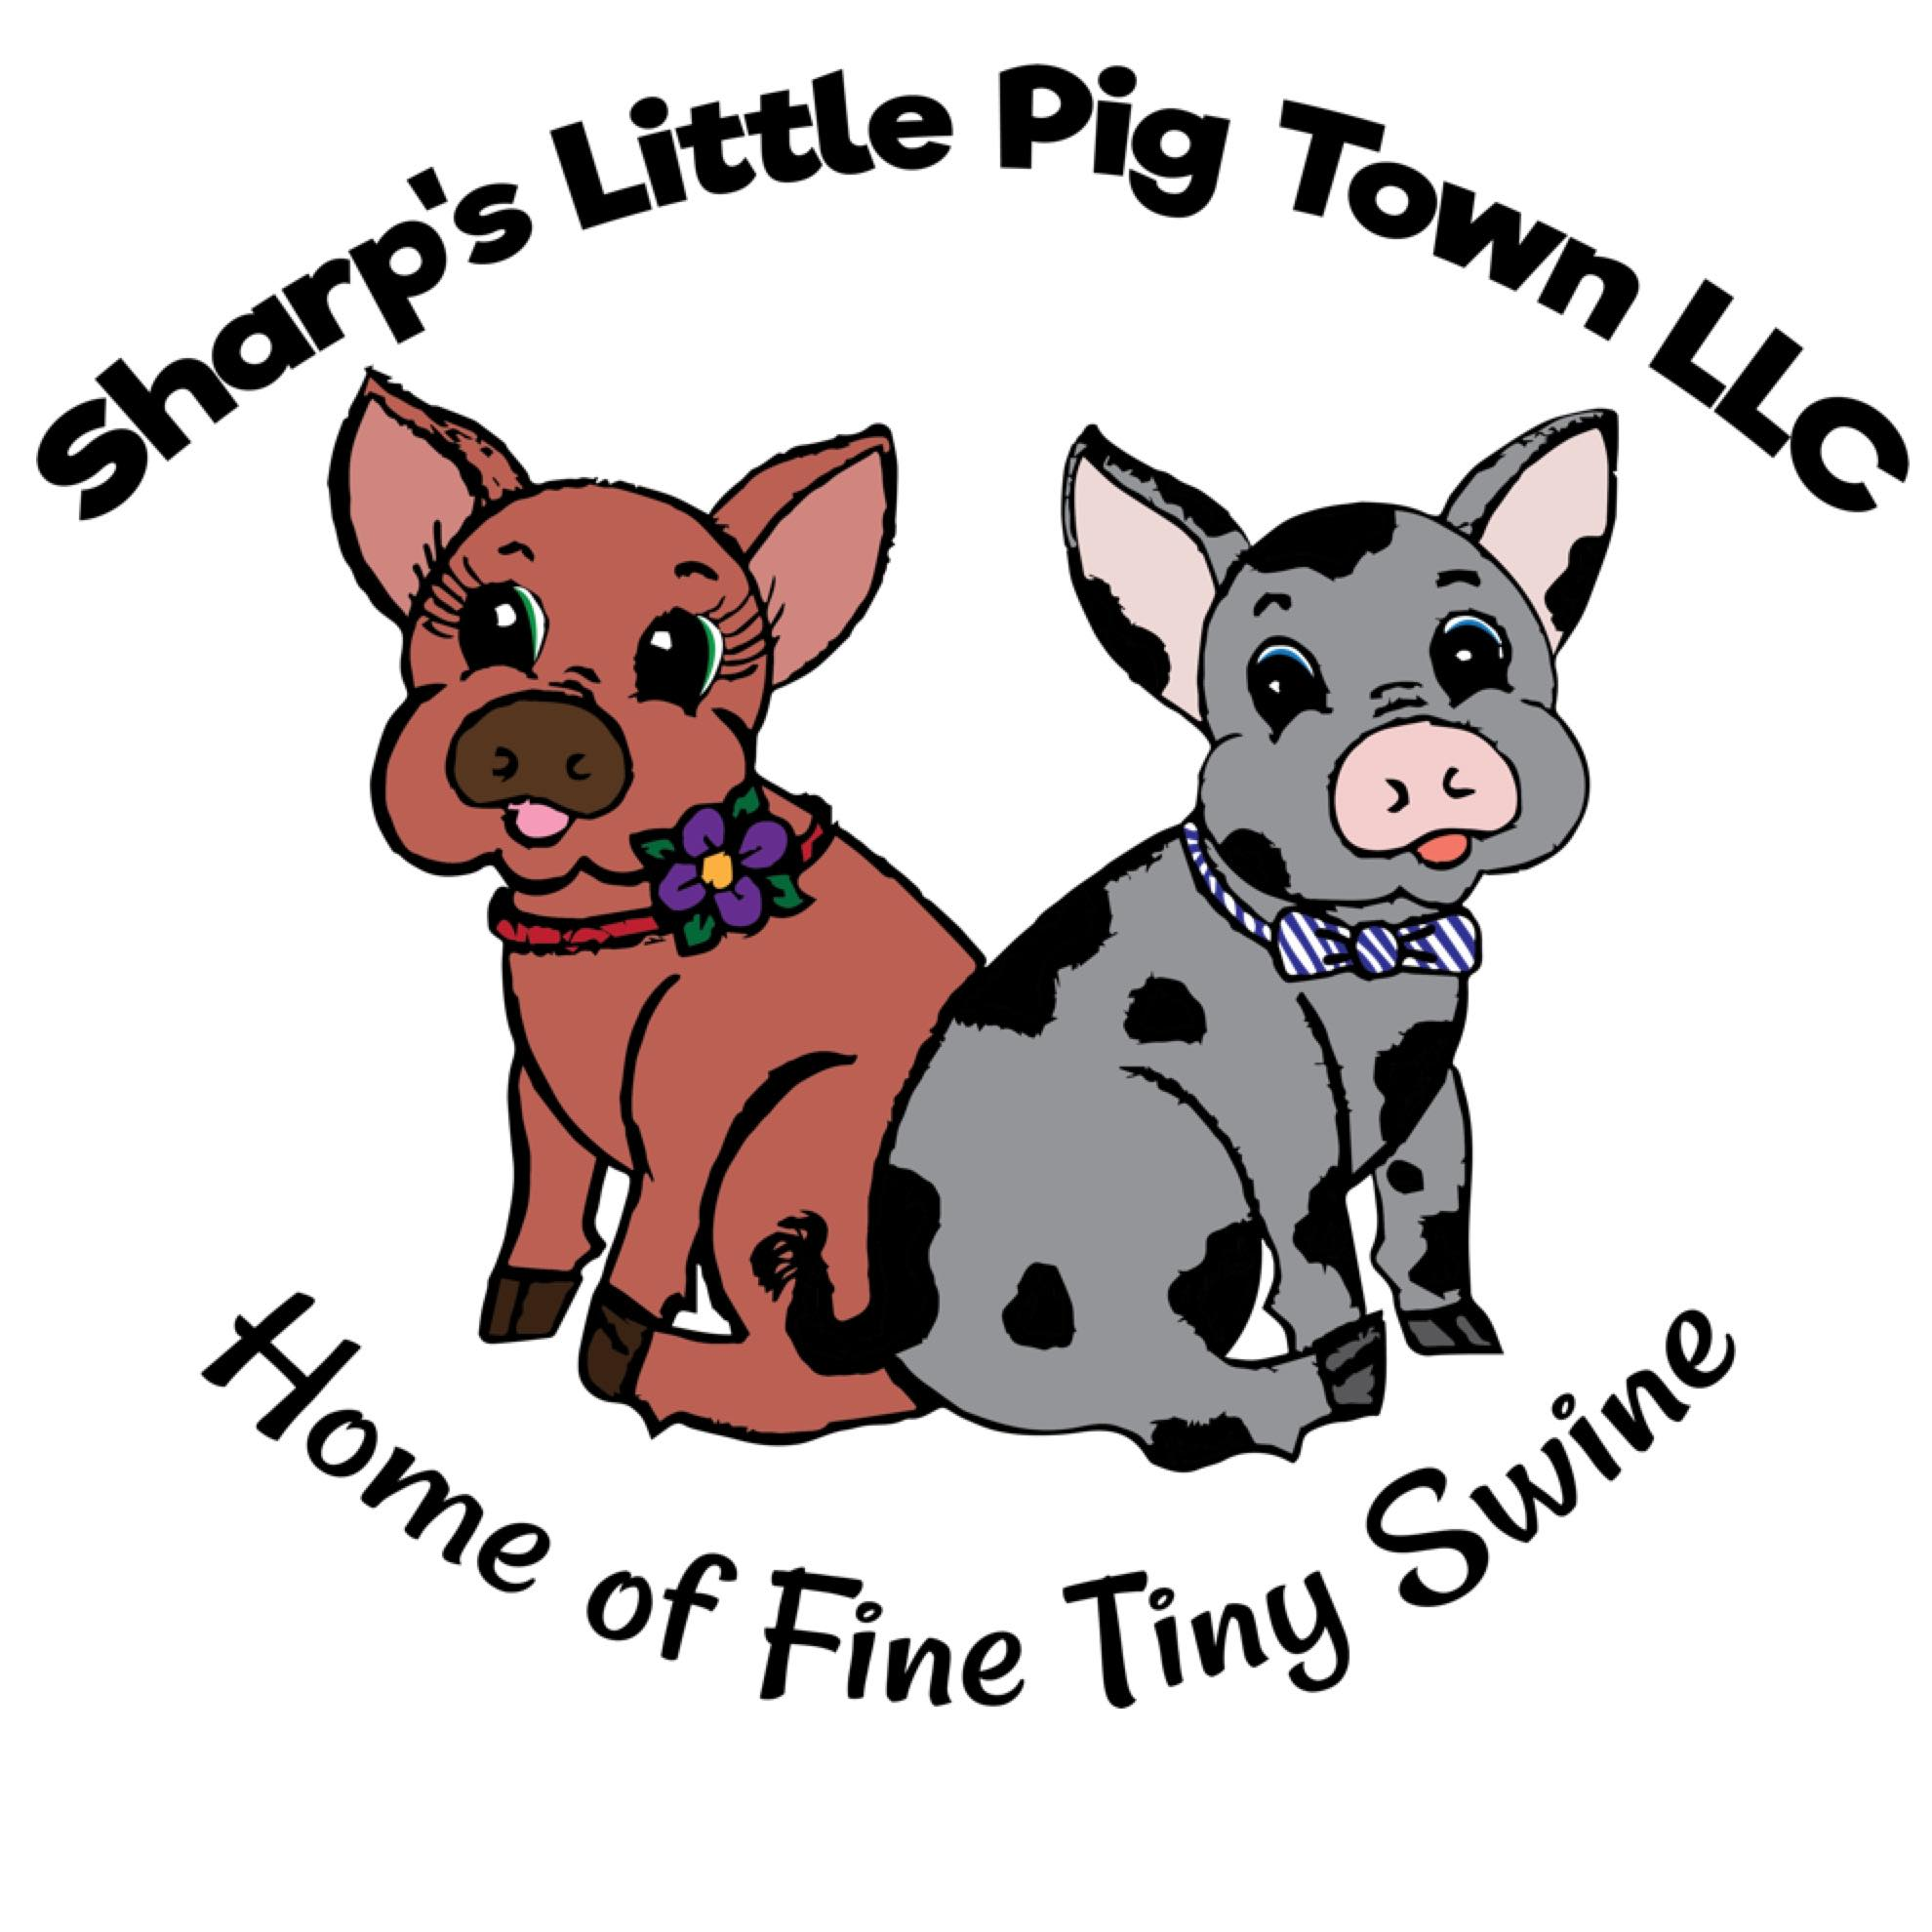 Sharp s little town. Clipart pig mini pig